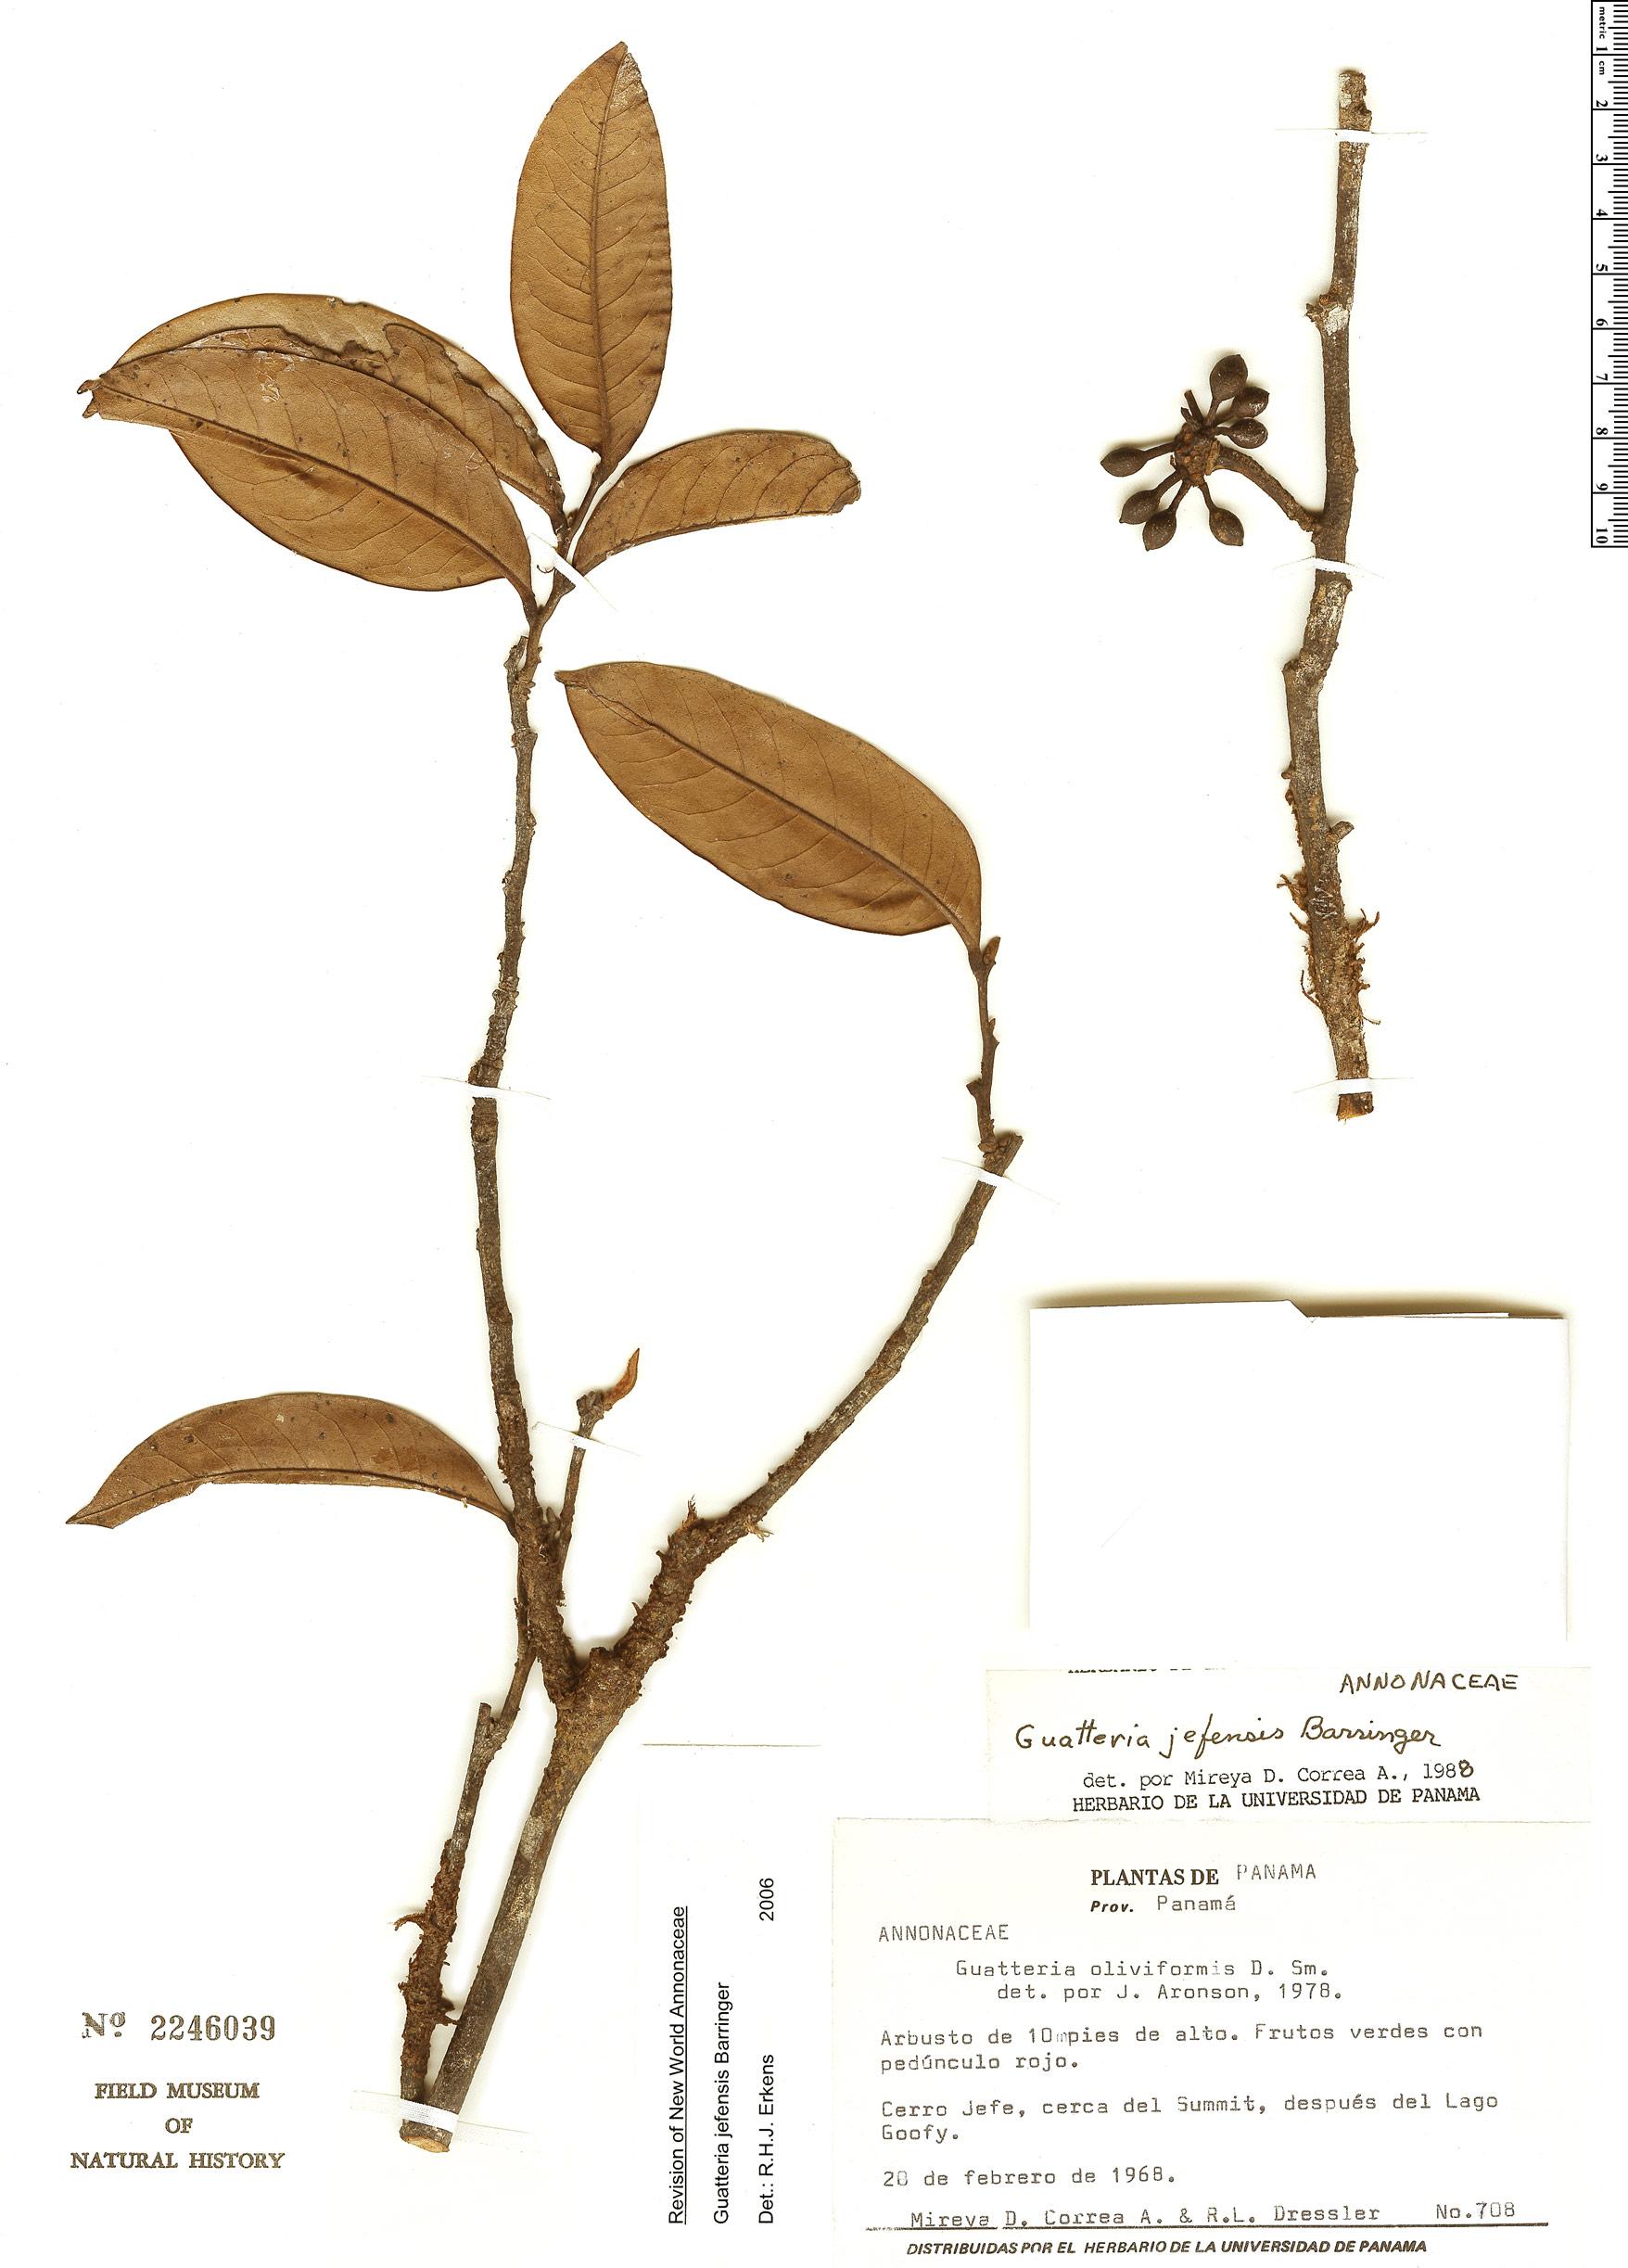 Specimen: Guatteria jefensis